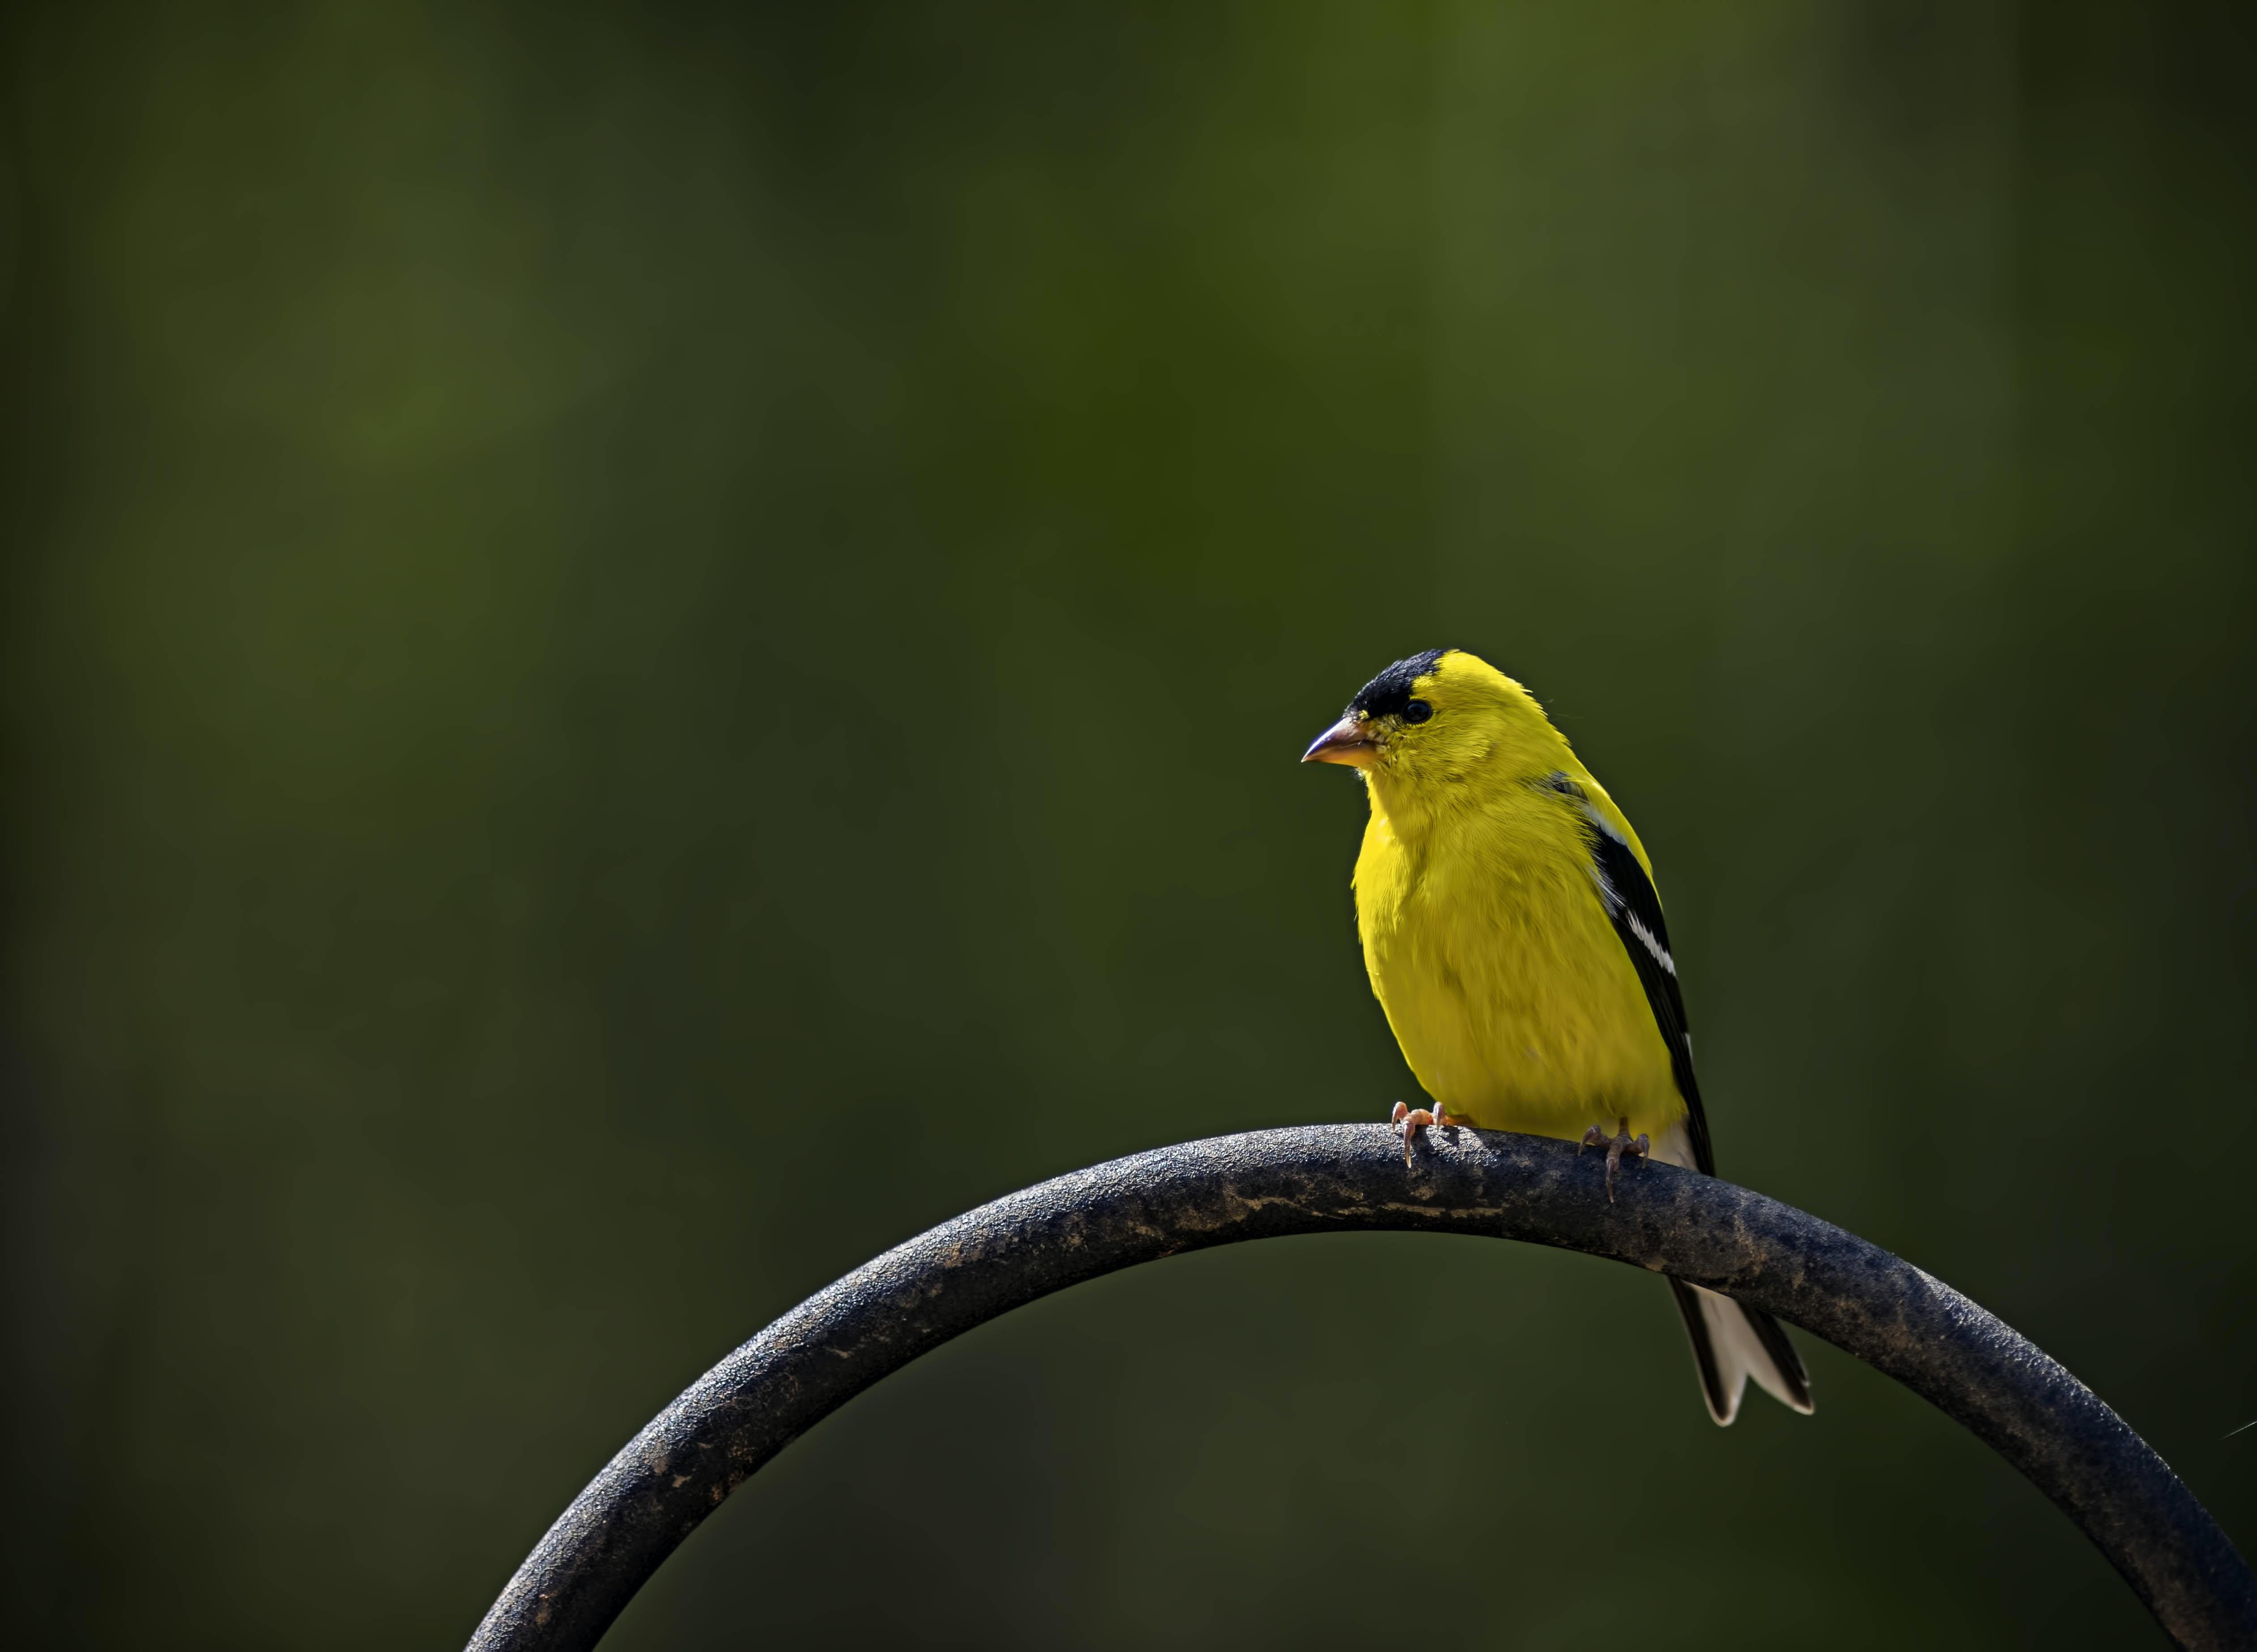 yellow bird standing on the branch